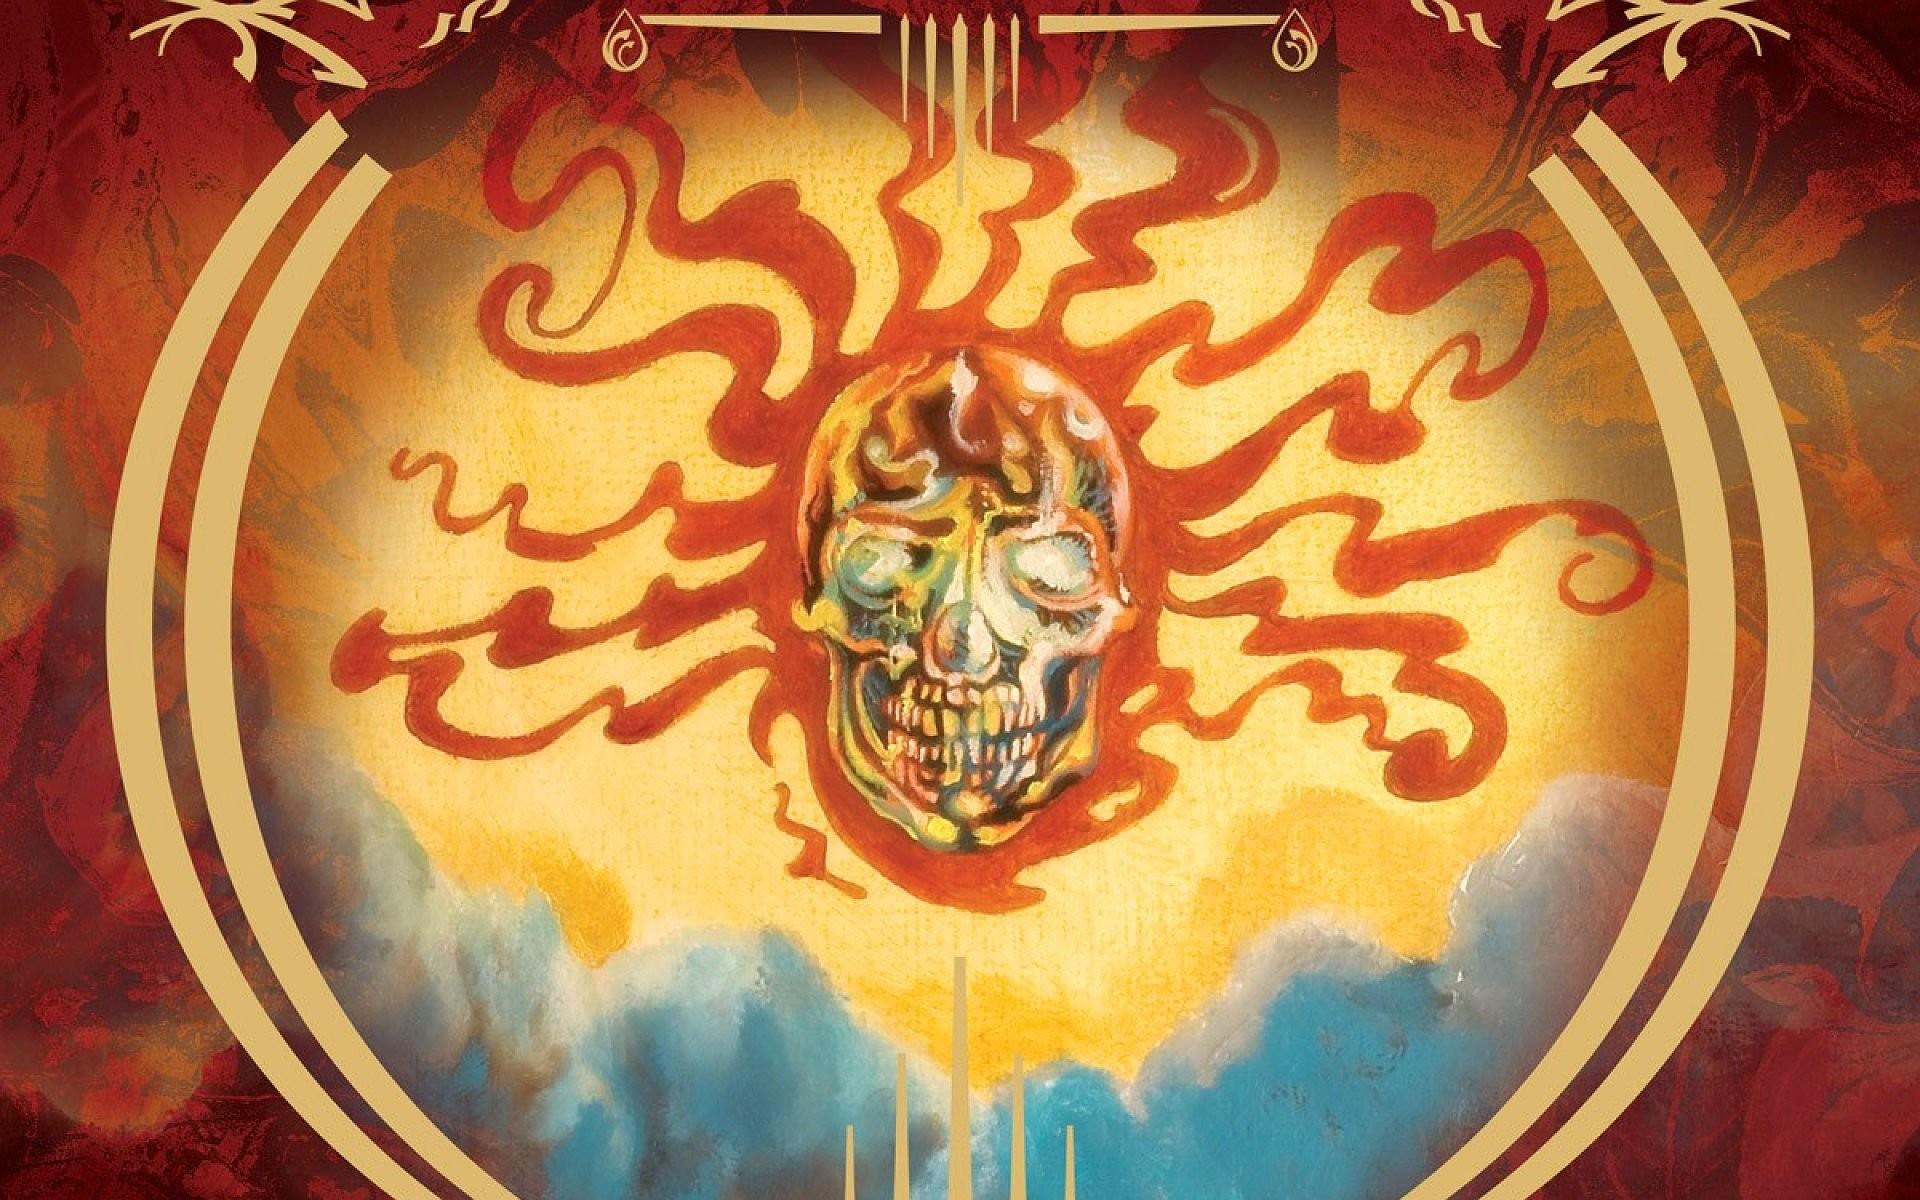 MASTODON sludge metal progressive heavy fantasy dark psychedelic skull  wallpaper | | 491917 | WallpaperUP